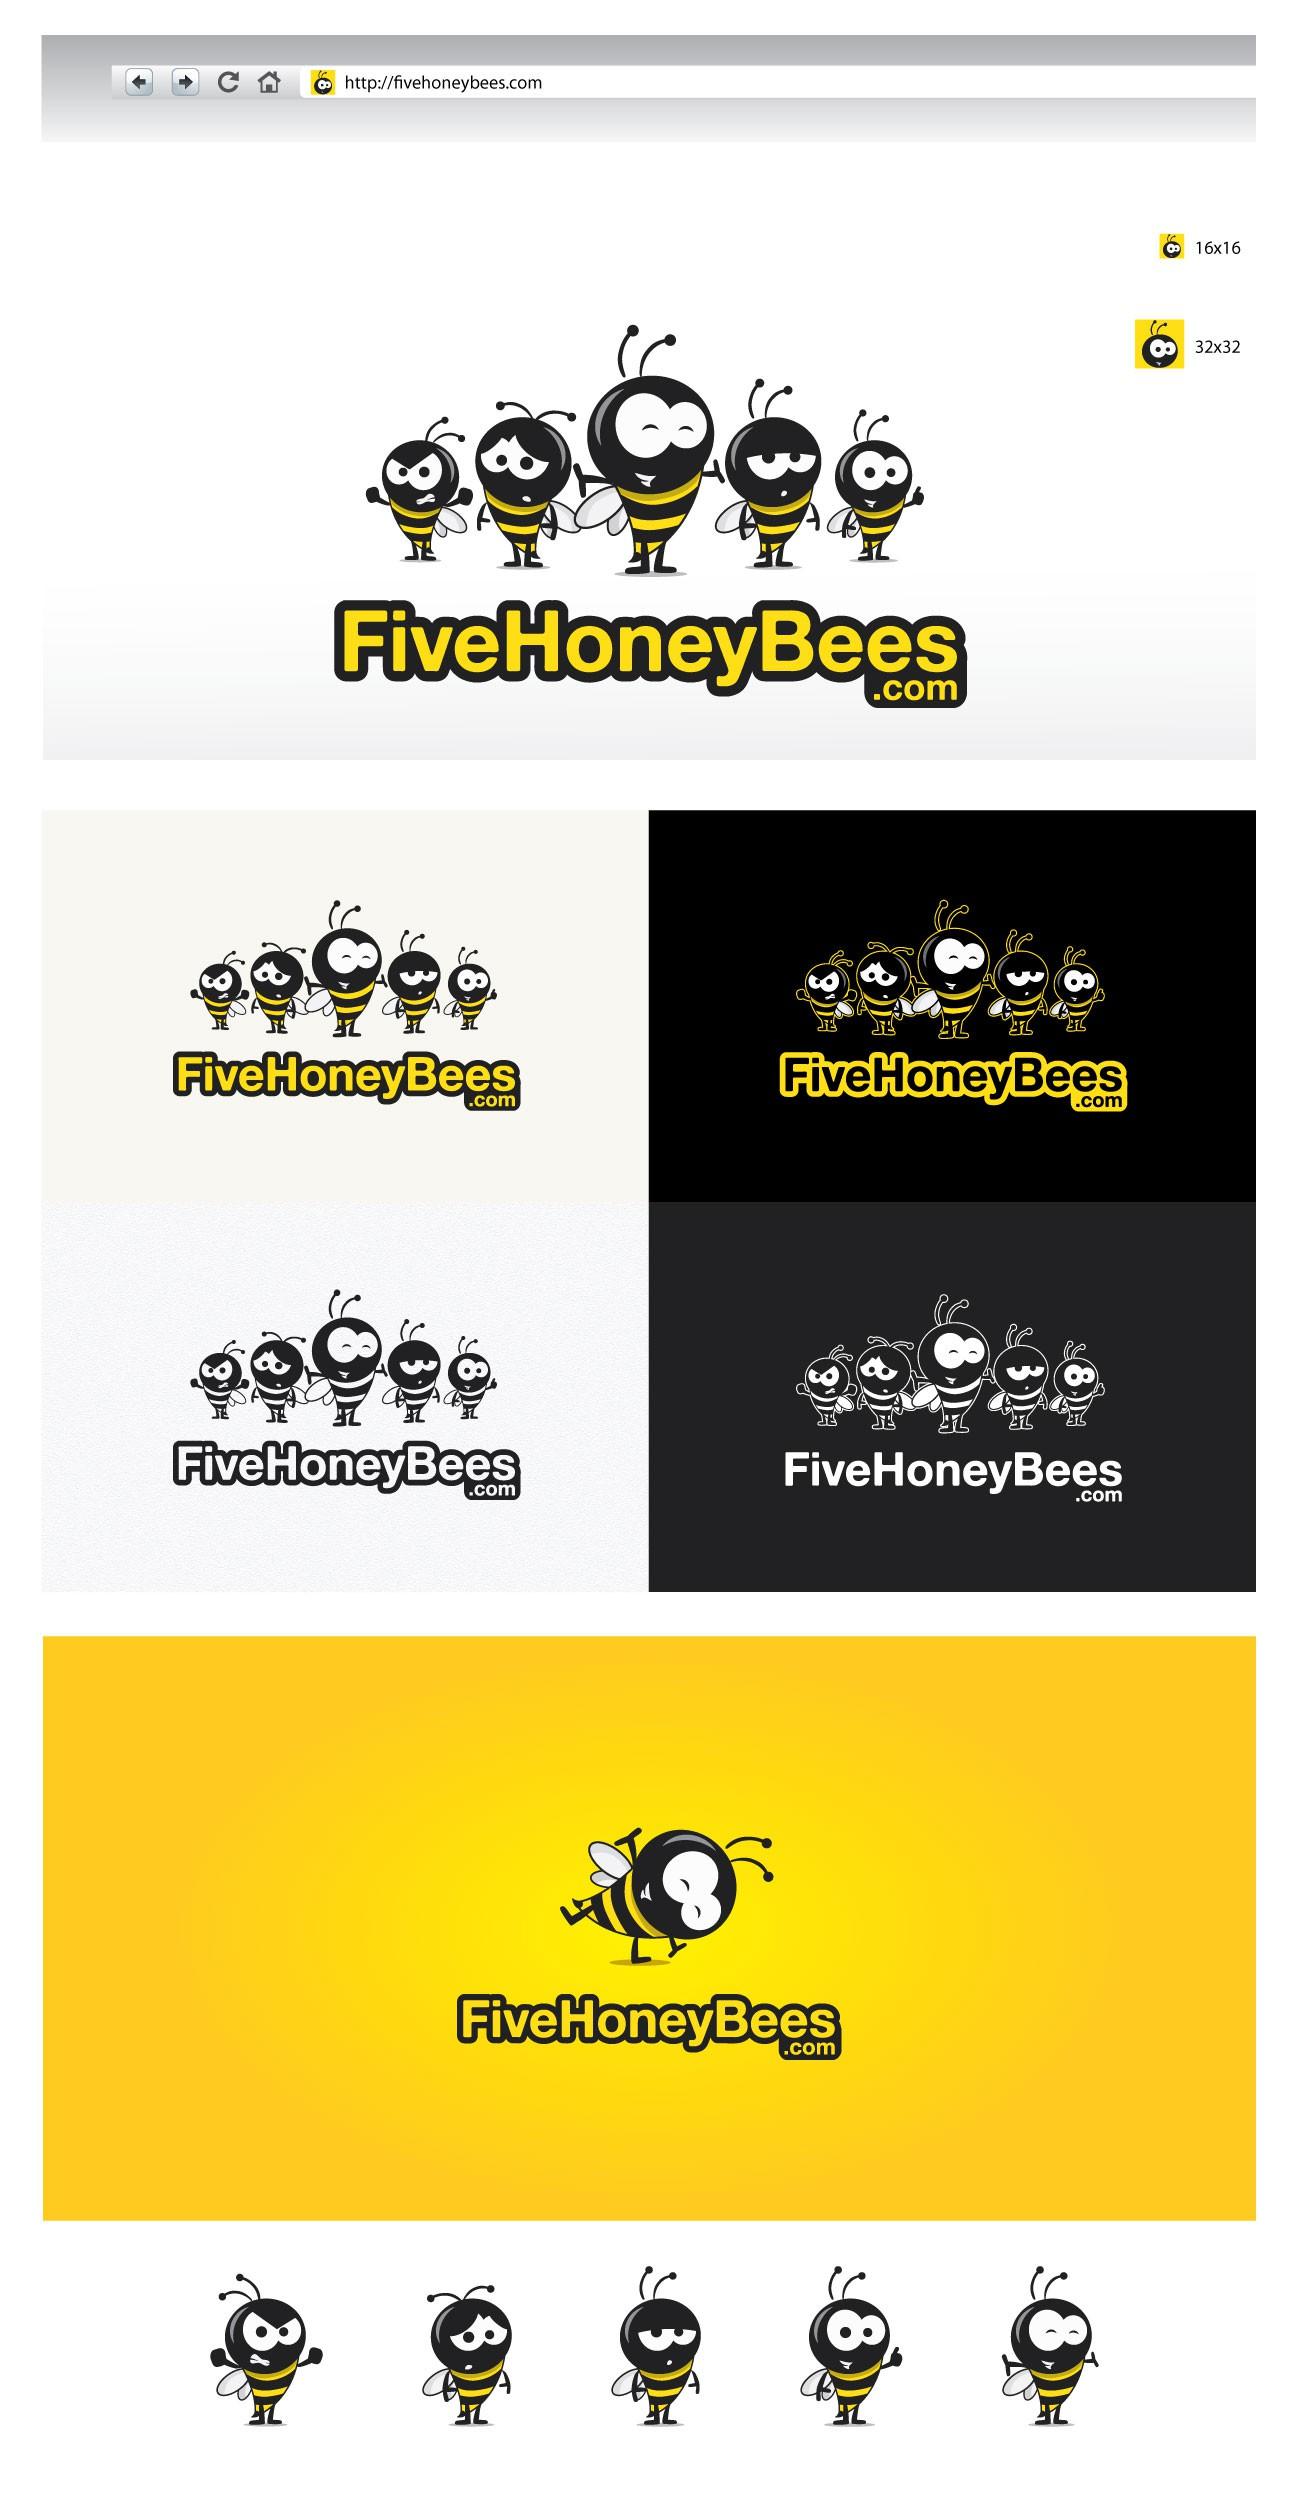 Help FiveHoneyBees.com with a new logo